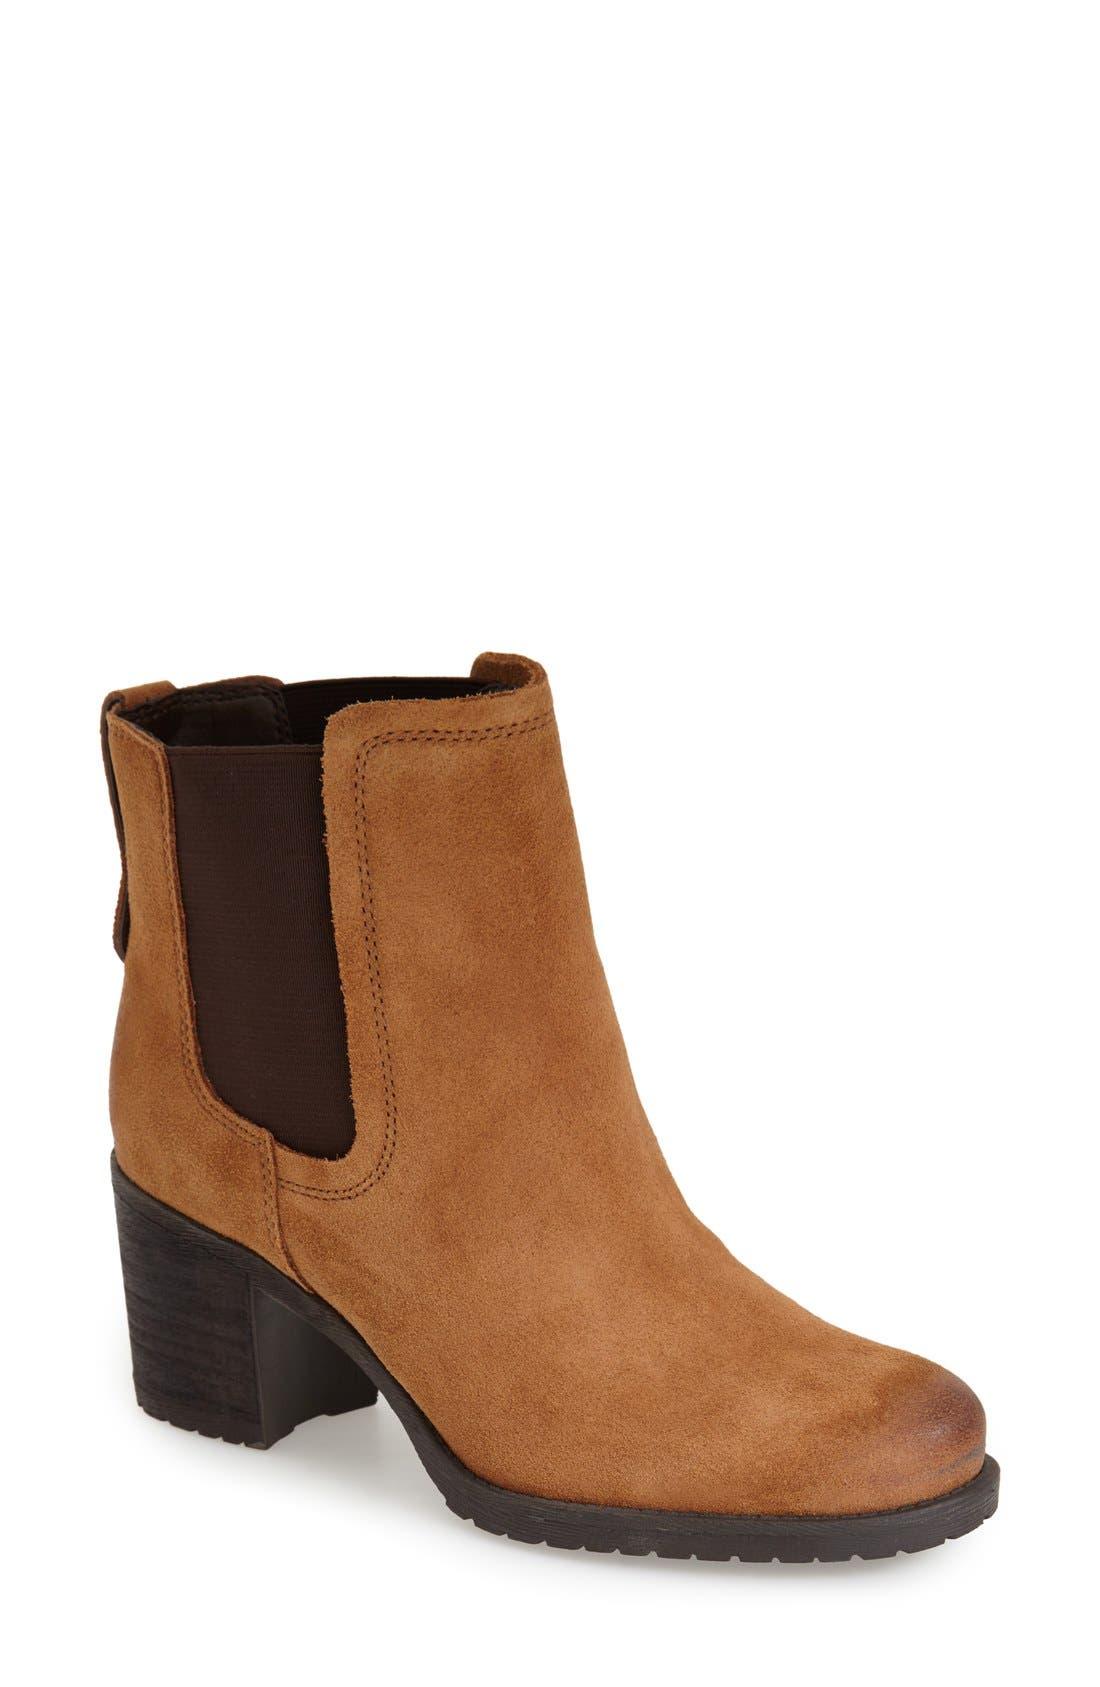 Main Image - Sam Edelman 'Hanley' Suede Chelsea Boot (Women)